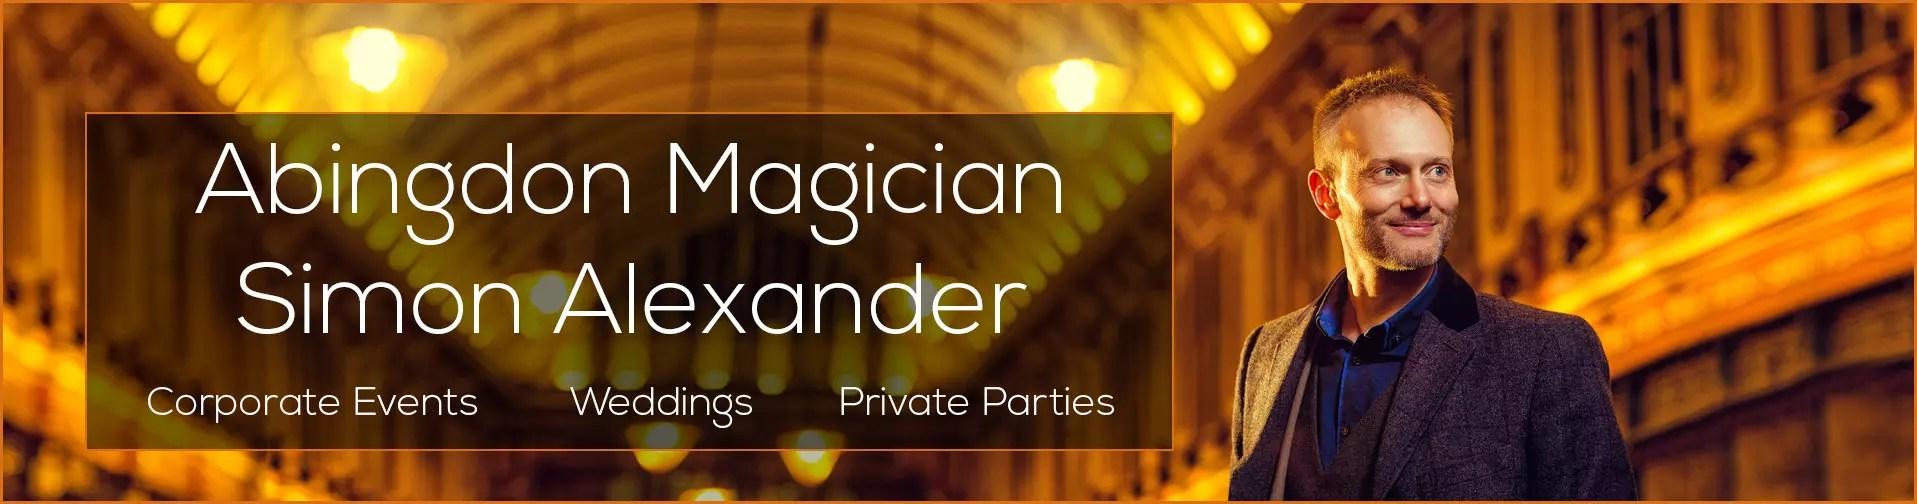 Magician in Abingdon Banner